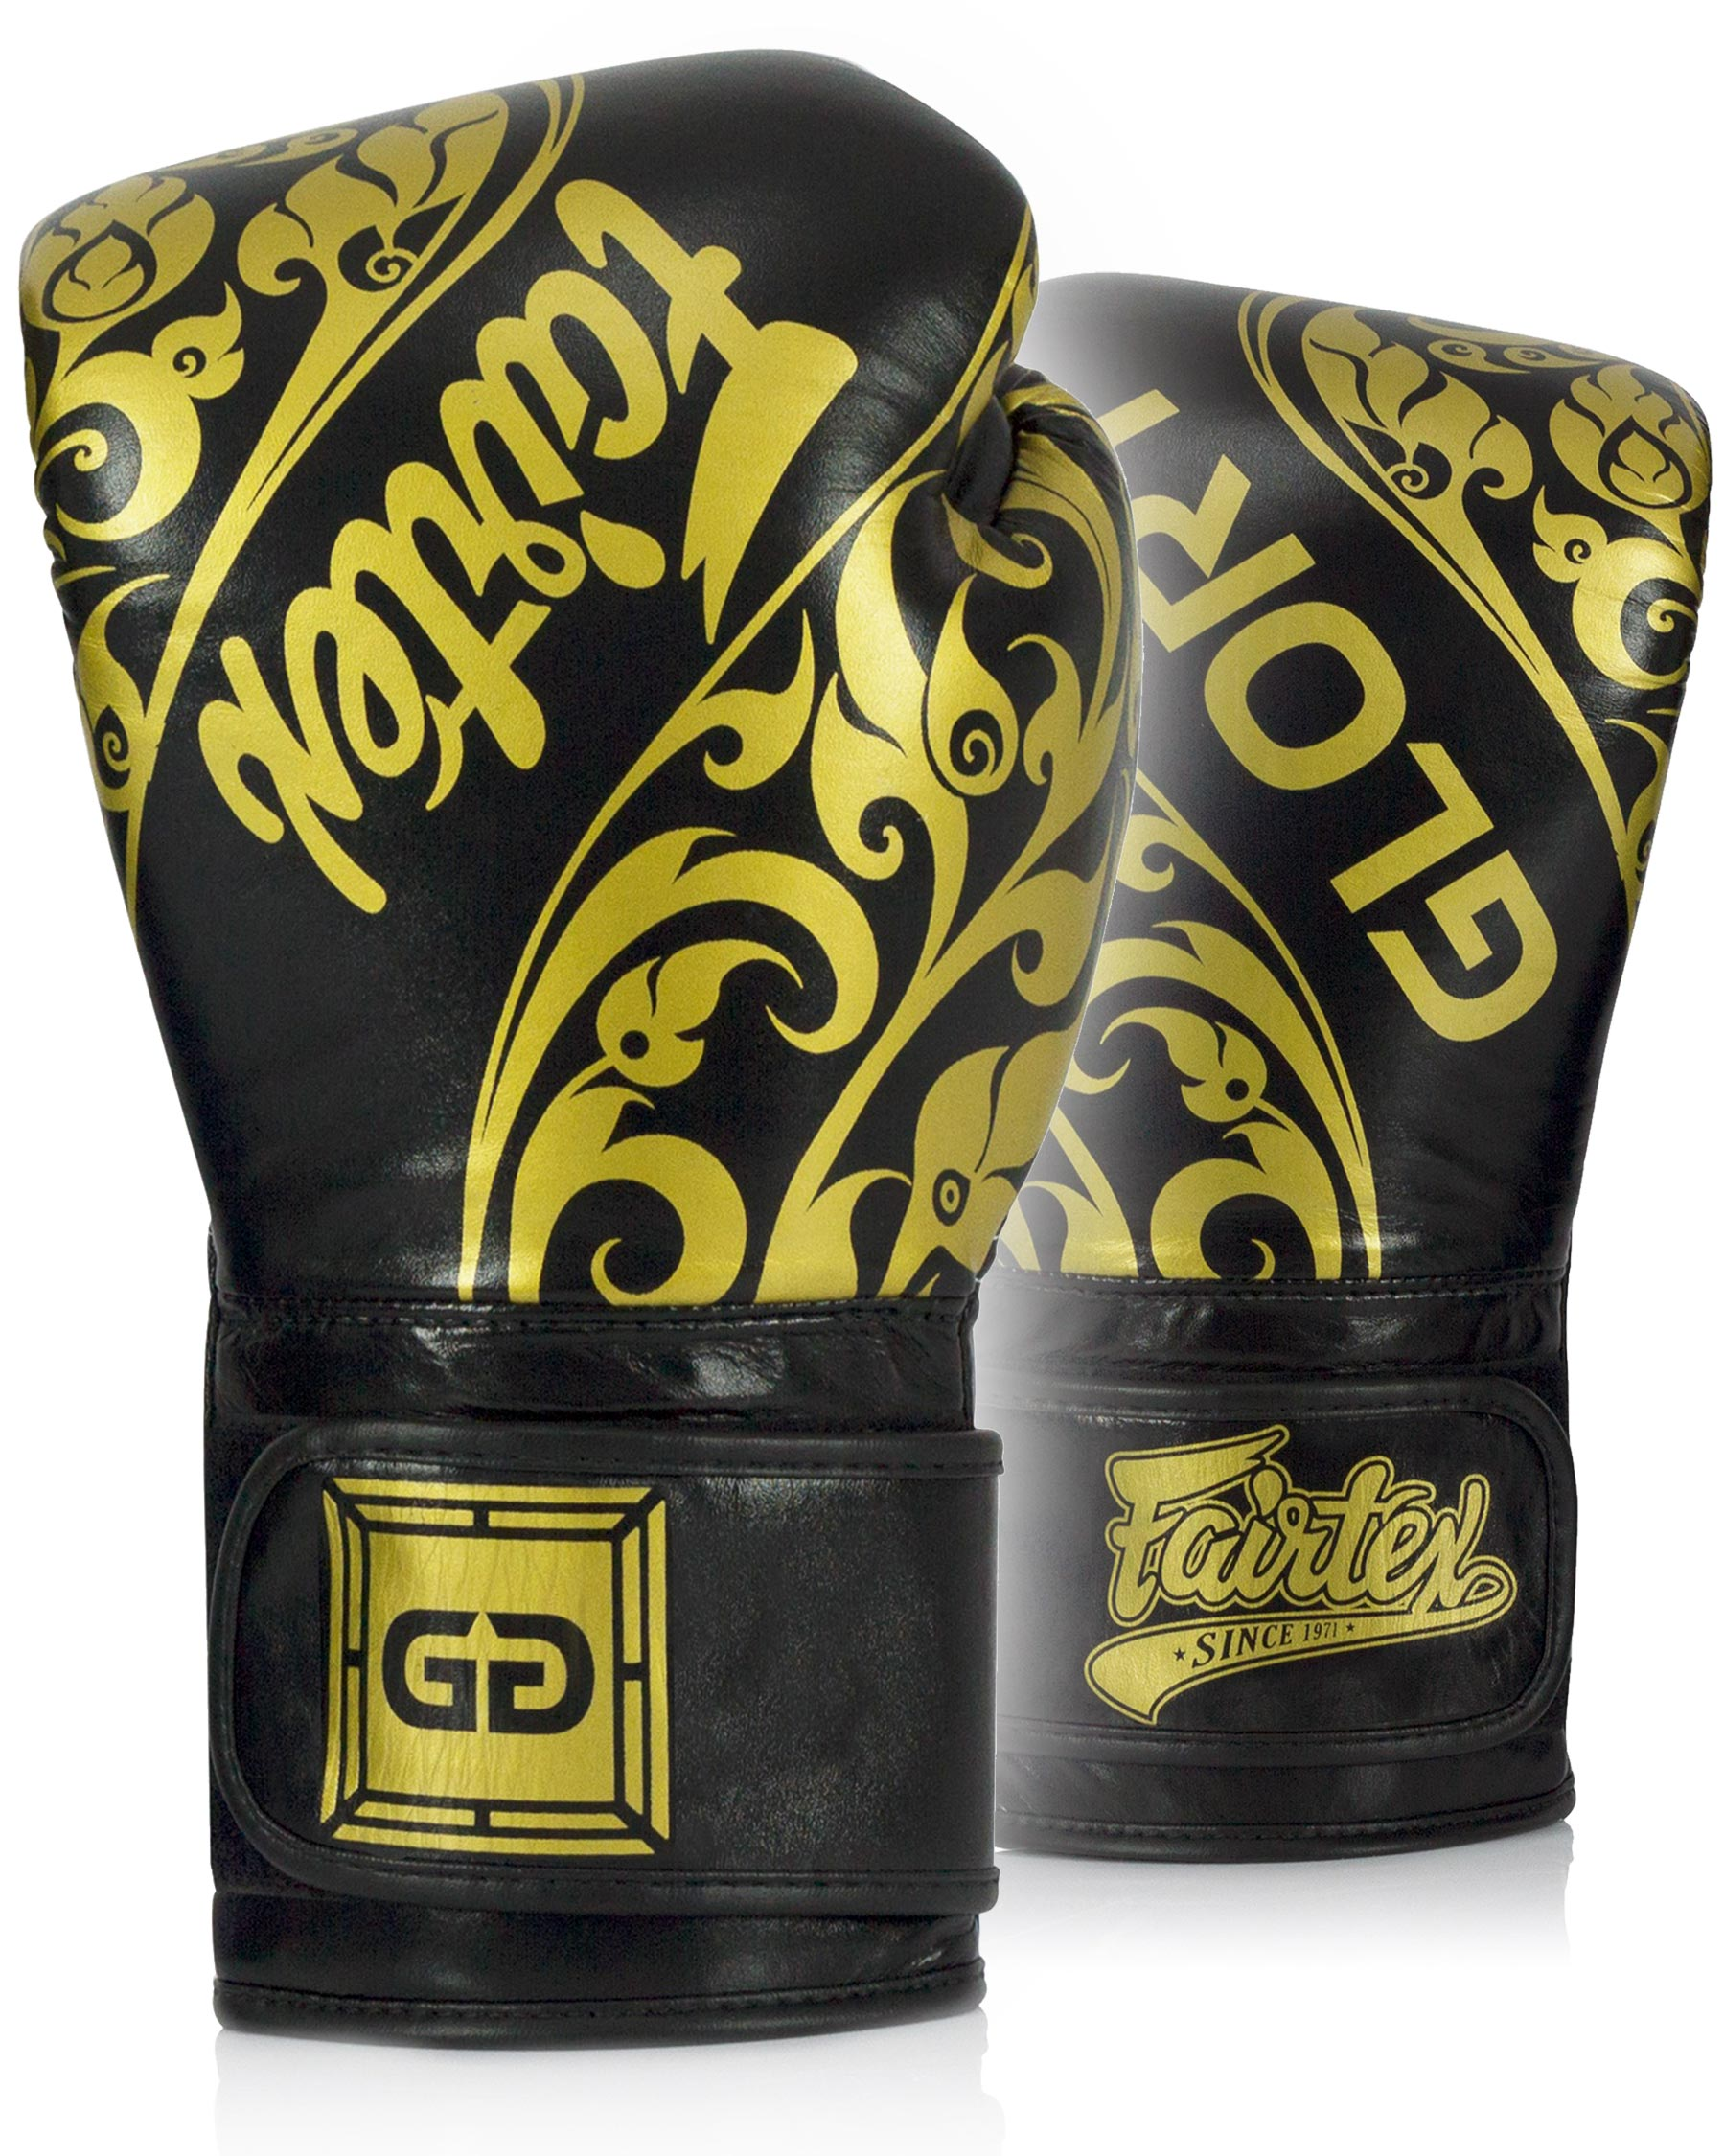 Fairtex Glory BGVG2 Gloves Black Boxing Muay Thai MMA Velcro Design Competition